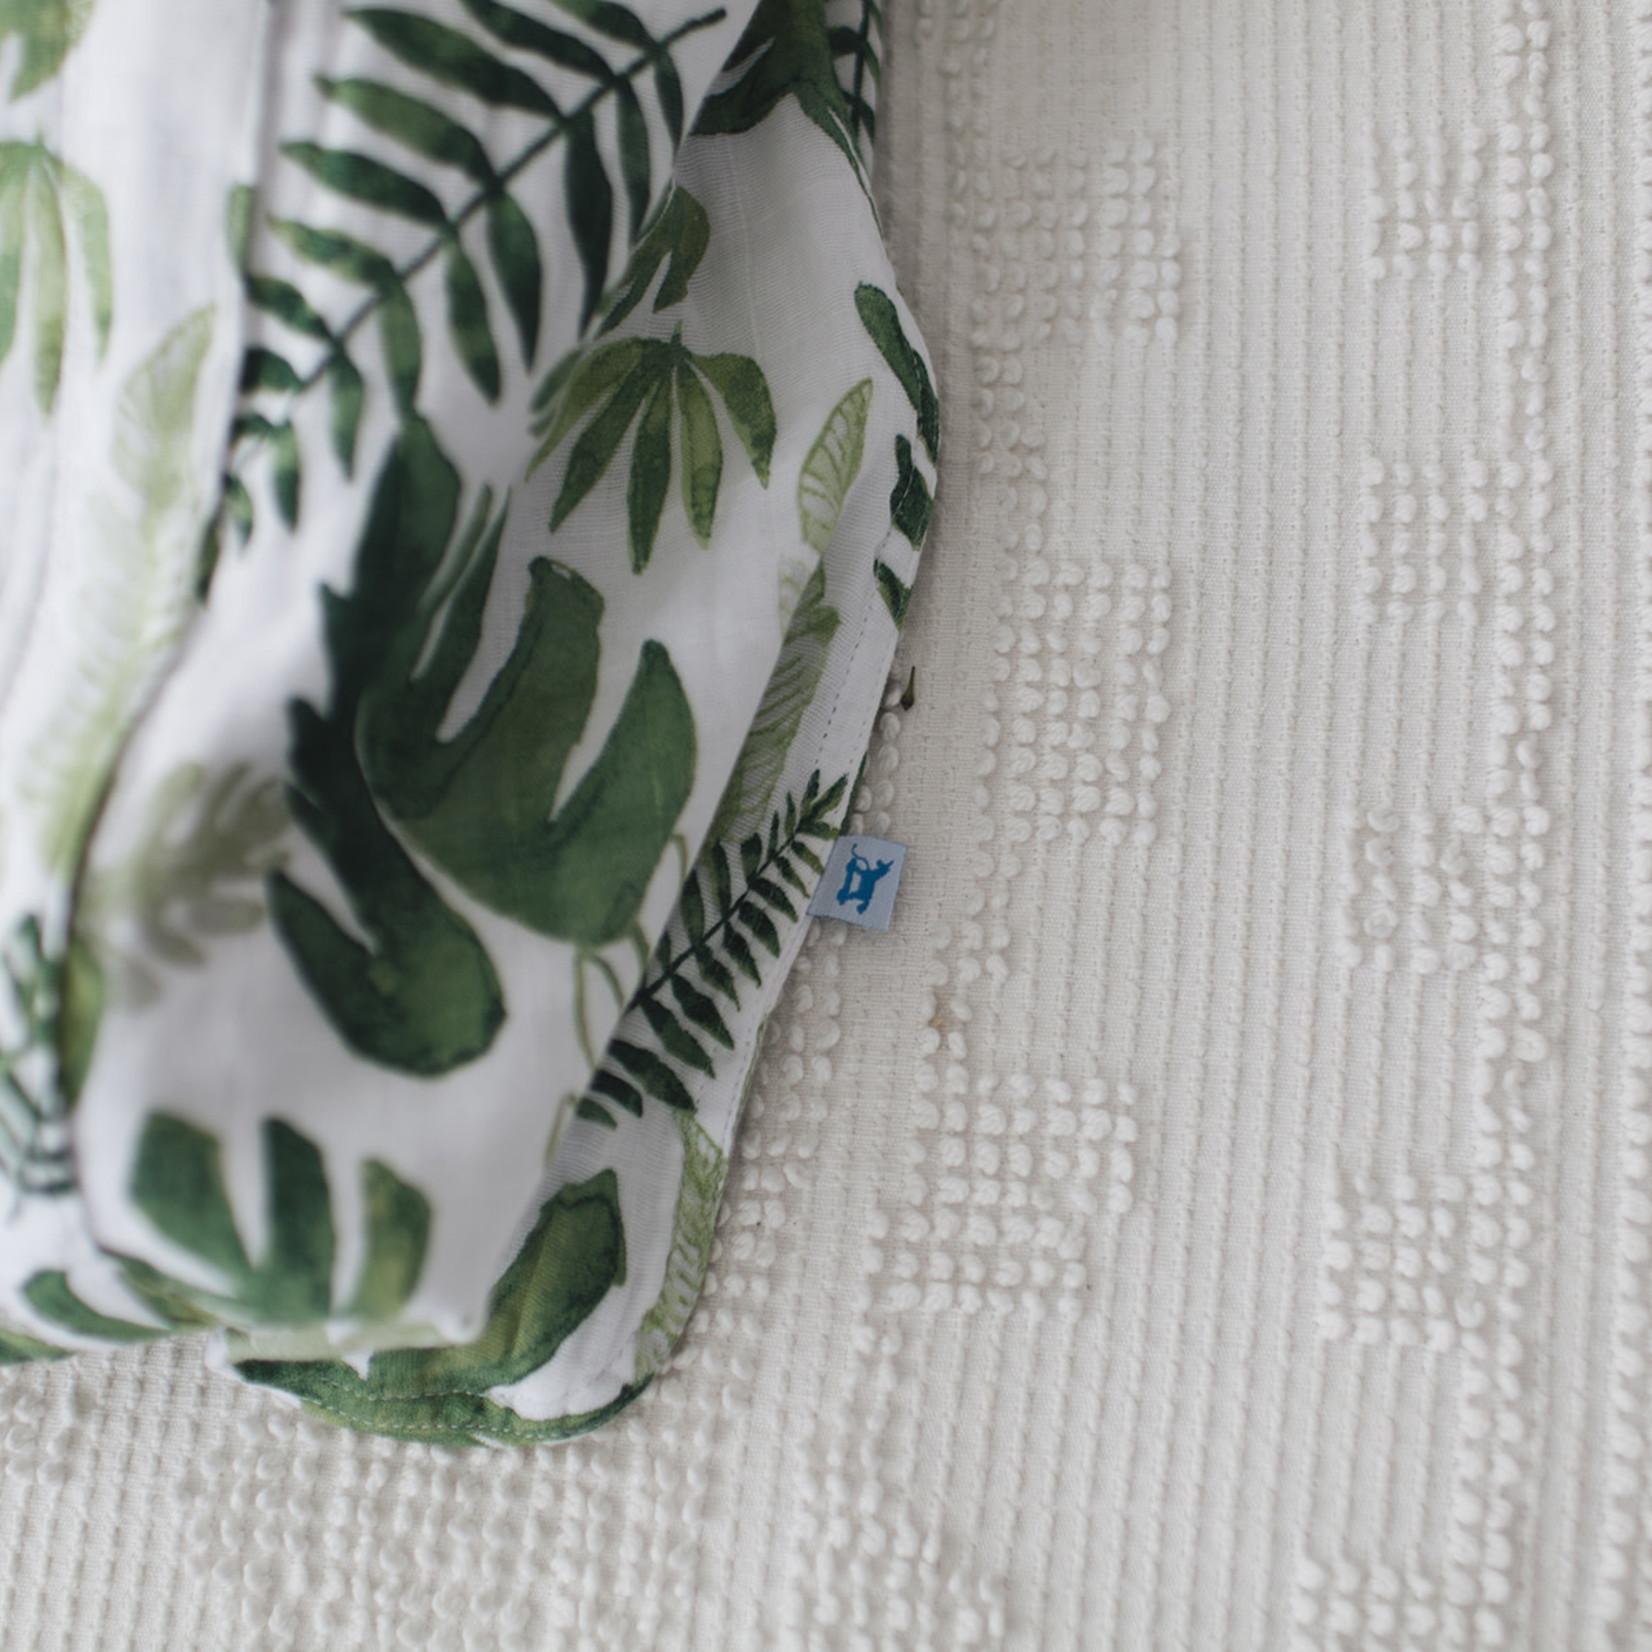 Little Unicorn Katoenen Tetra Slaapzak - Tropisch blad - Small